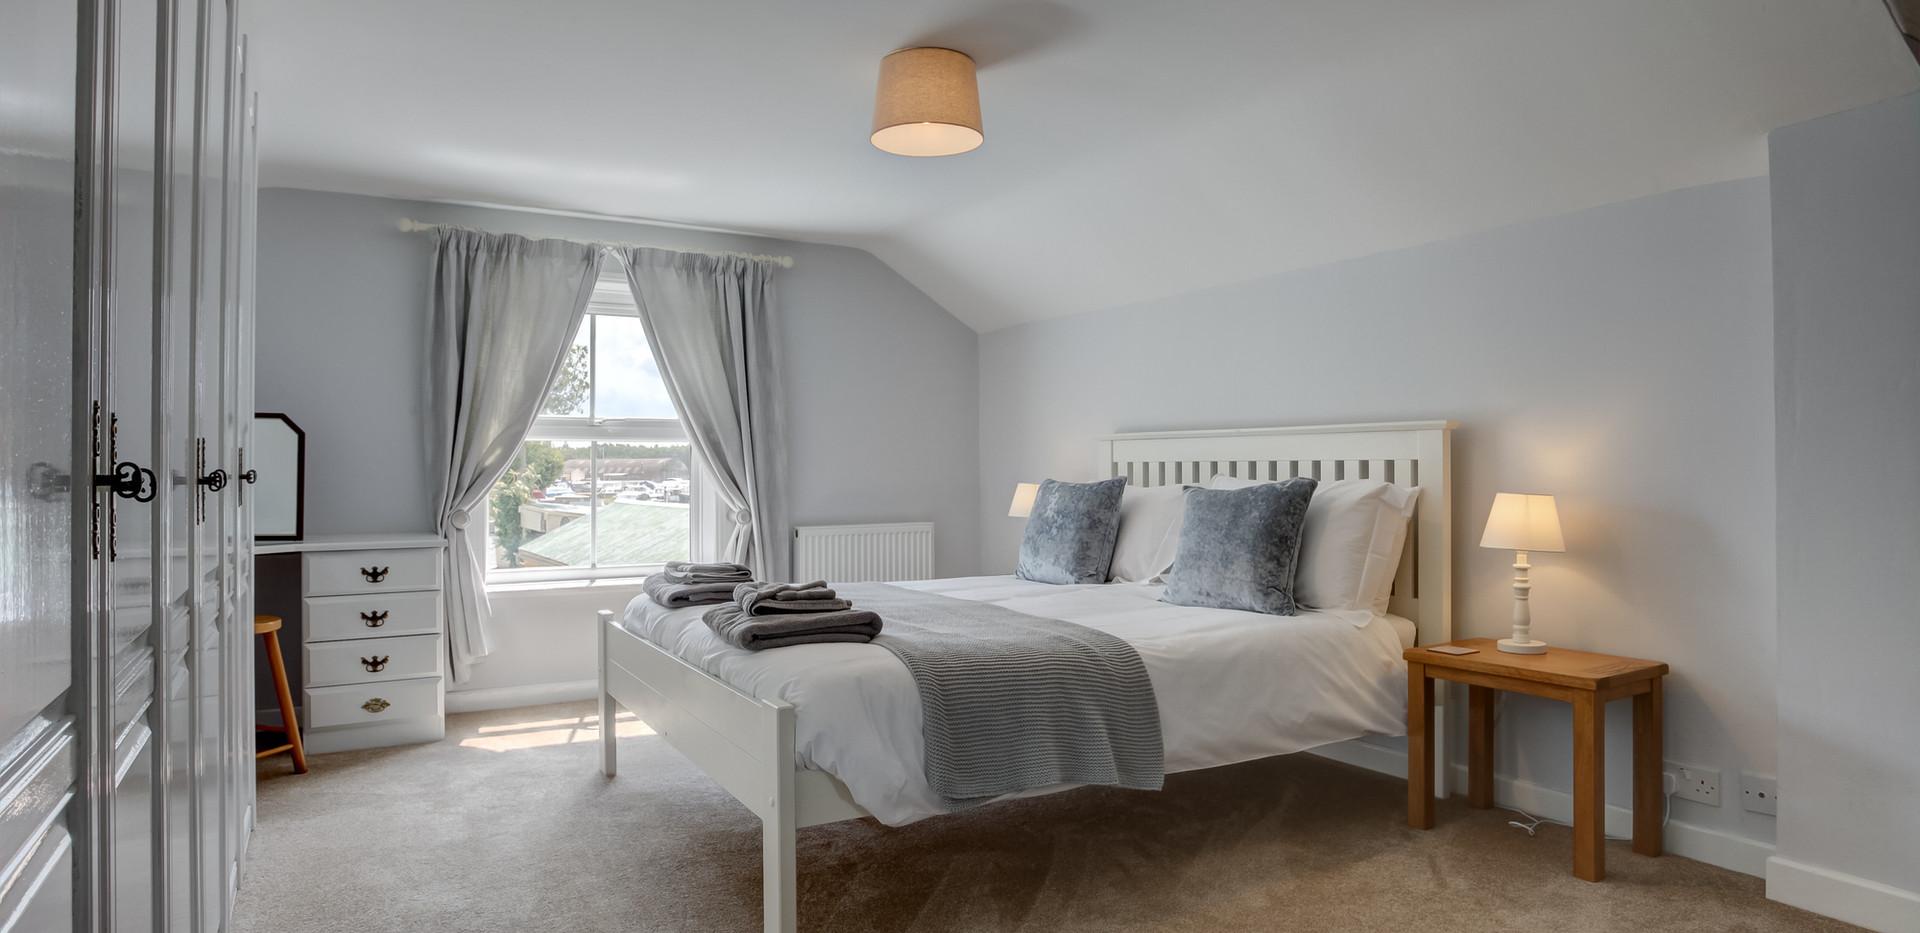 riverside-main-bedroom-2.jpg